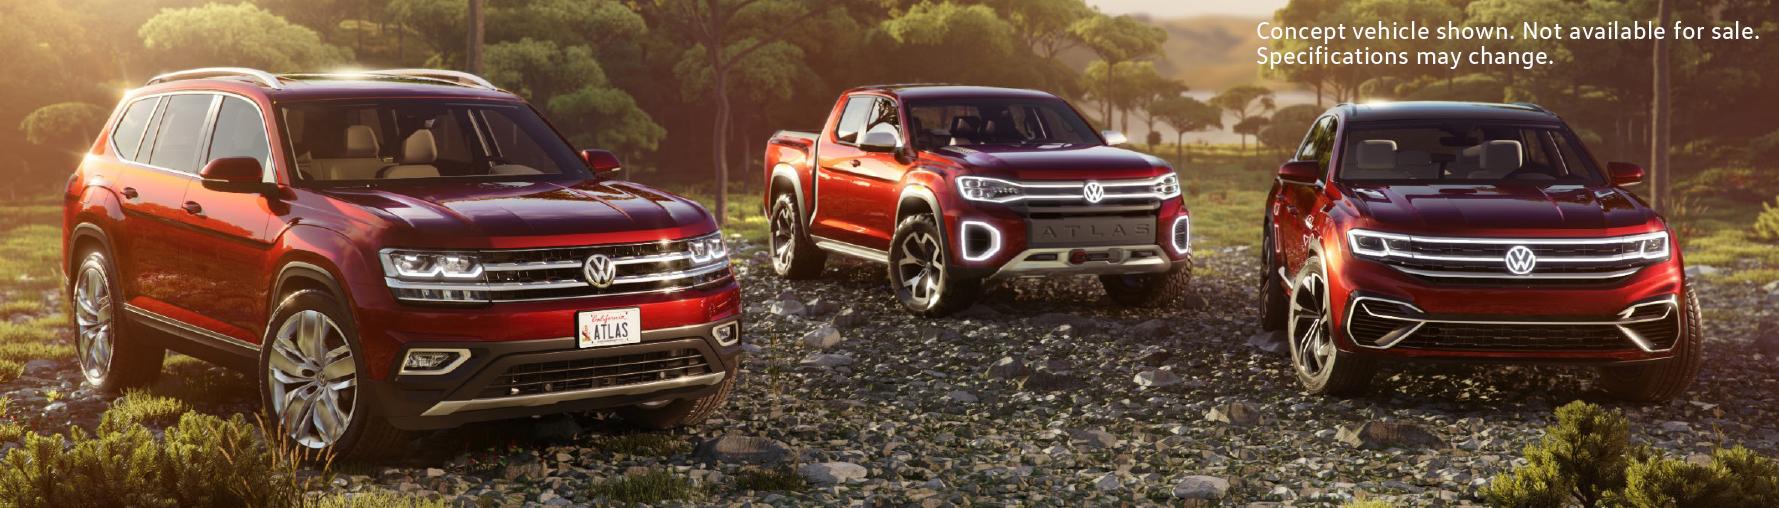 Volkswagen-Atlas-Atlas-Tanoak-Concept-and-Atlas-Sport-Concept-parked-in-wooded-area